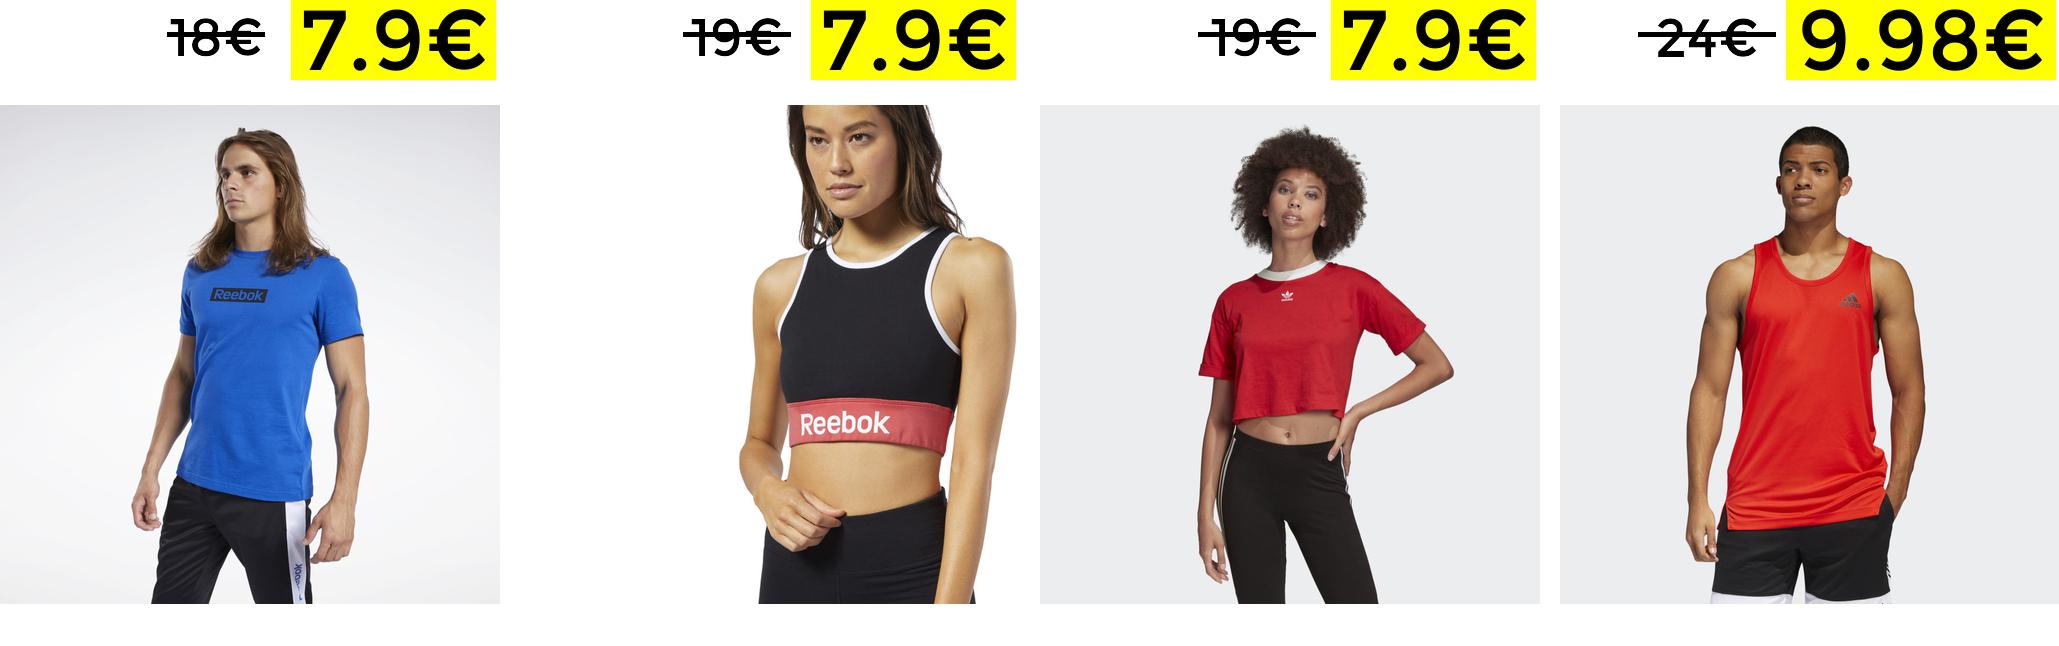 Outlet Adidas e Reebok 50% + 20% Extra